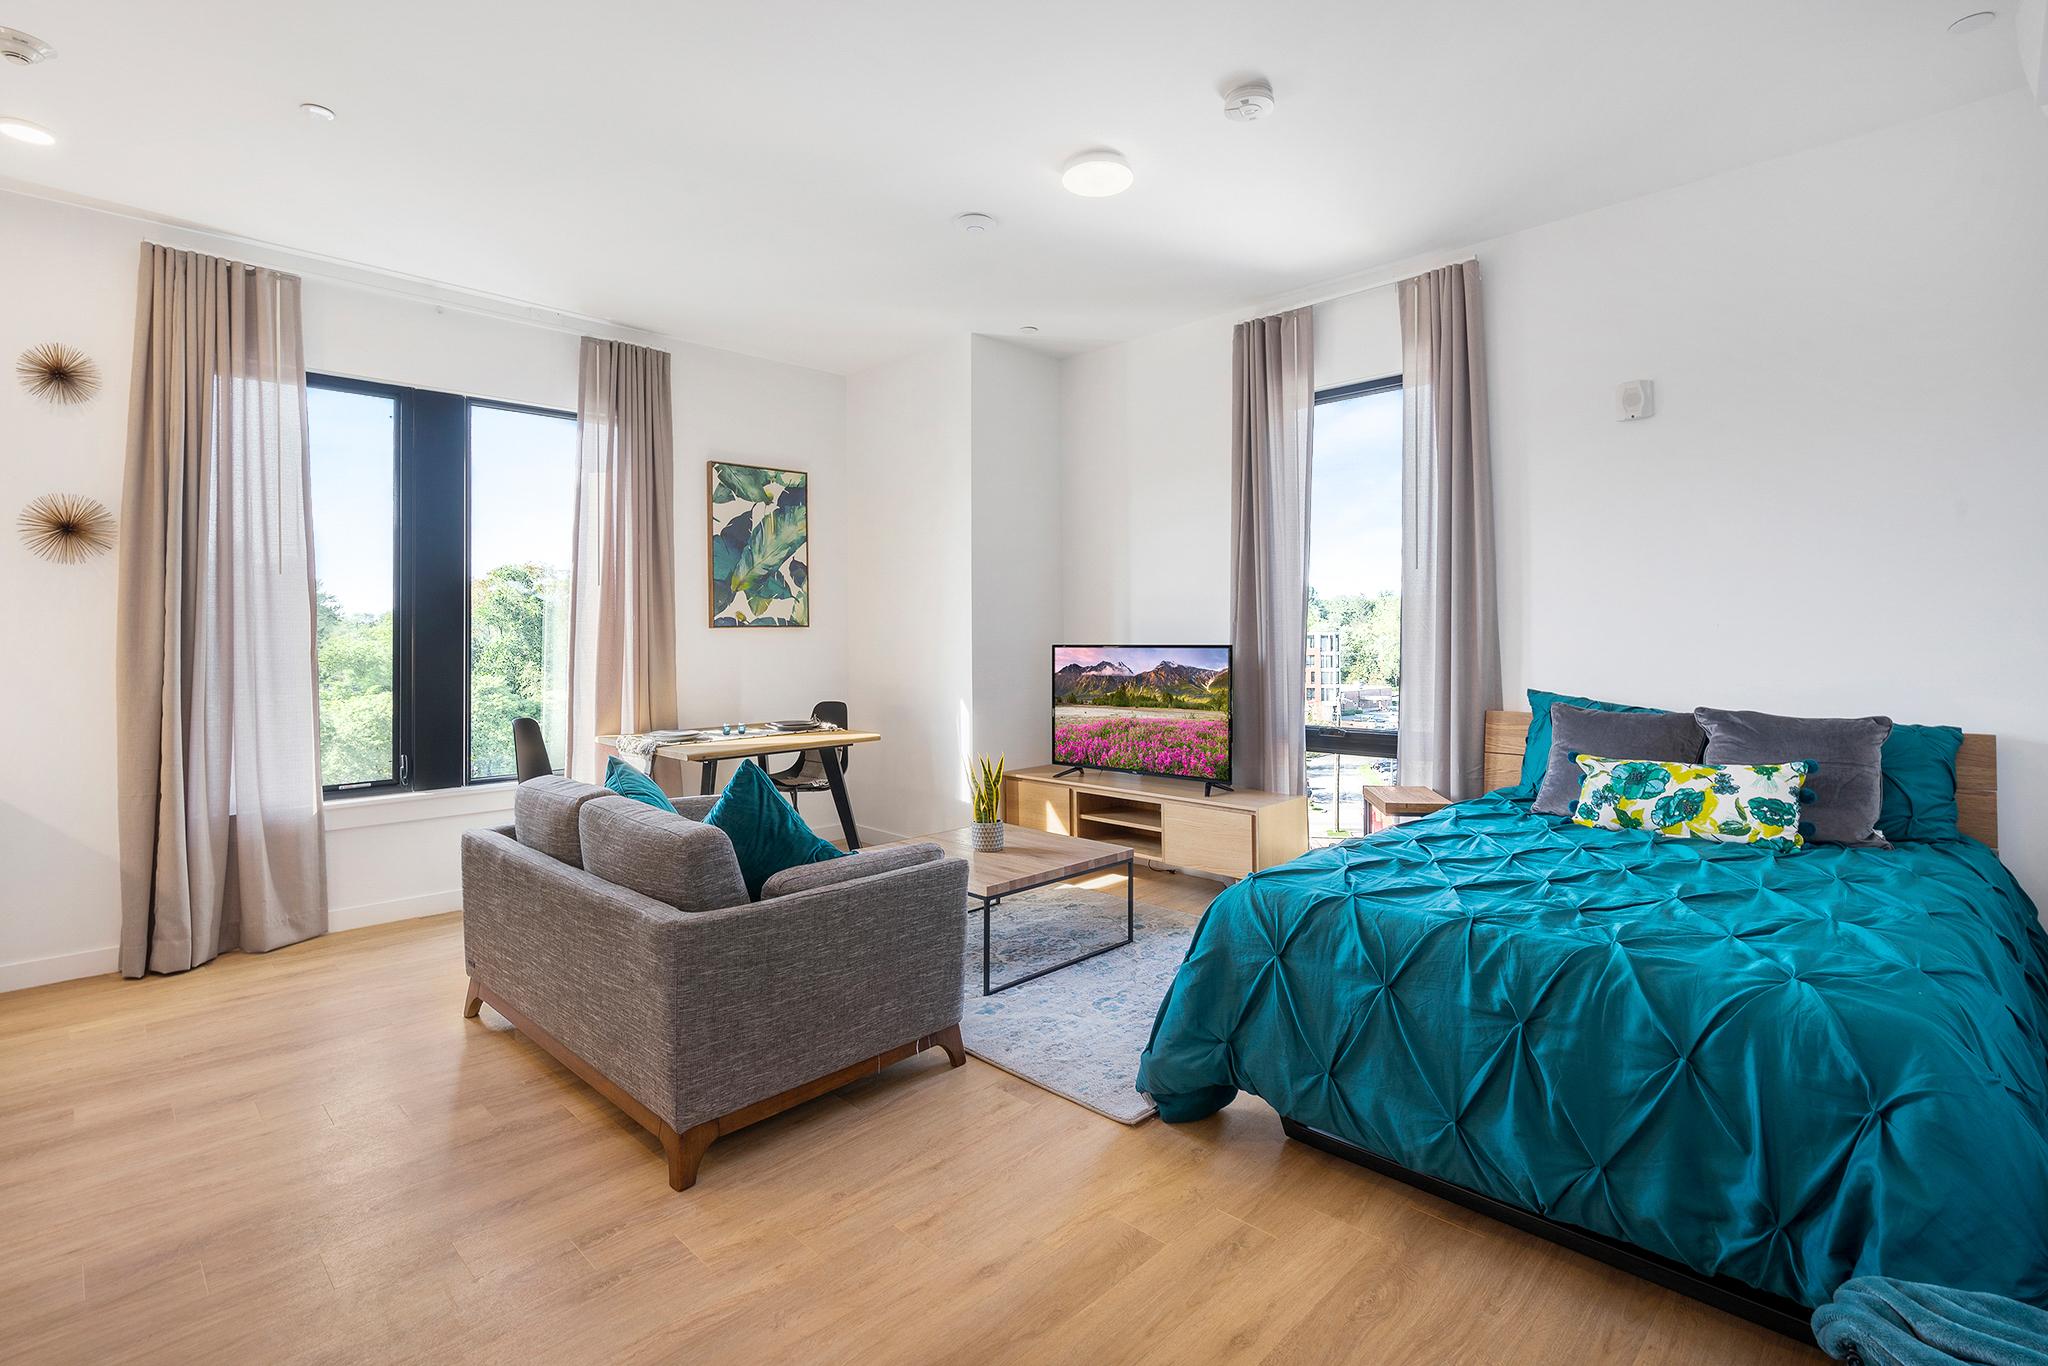 Living & Sleeping Area